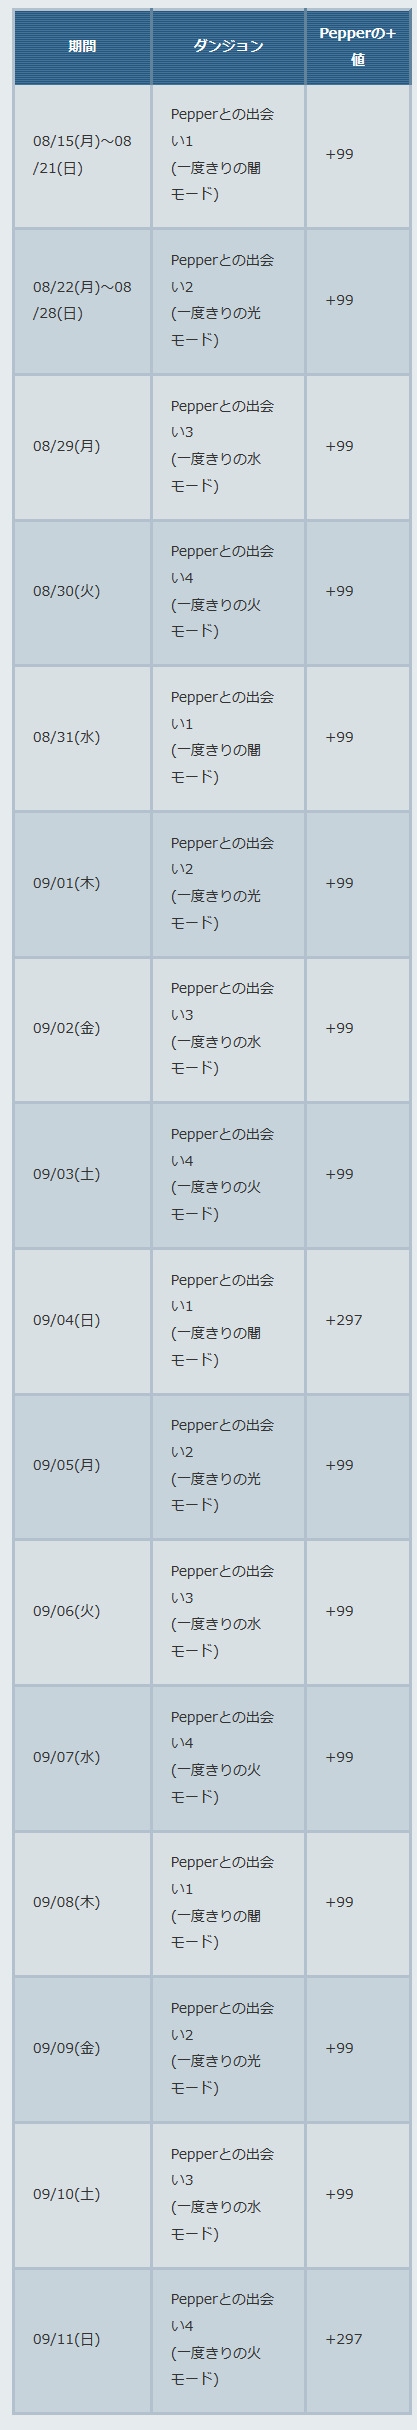 Pepper×パズドラ パズドラレーダー-20160825